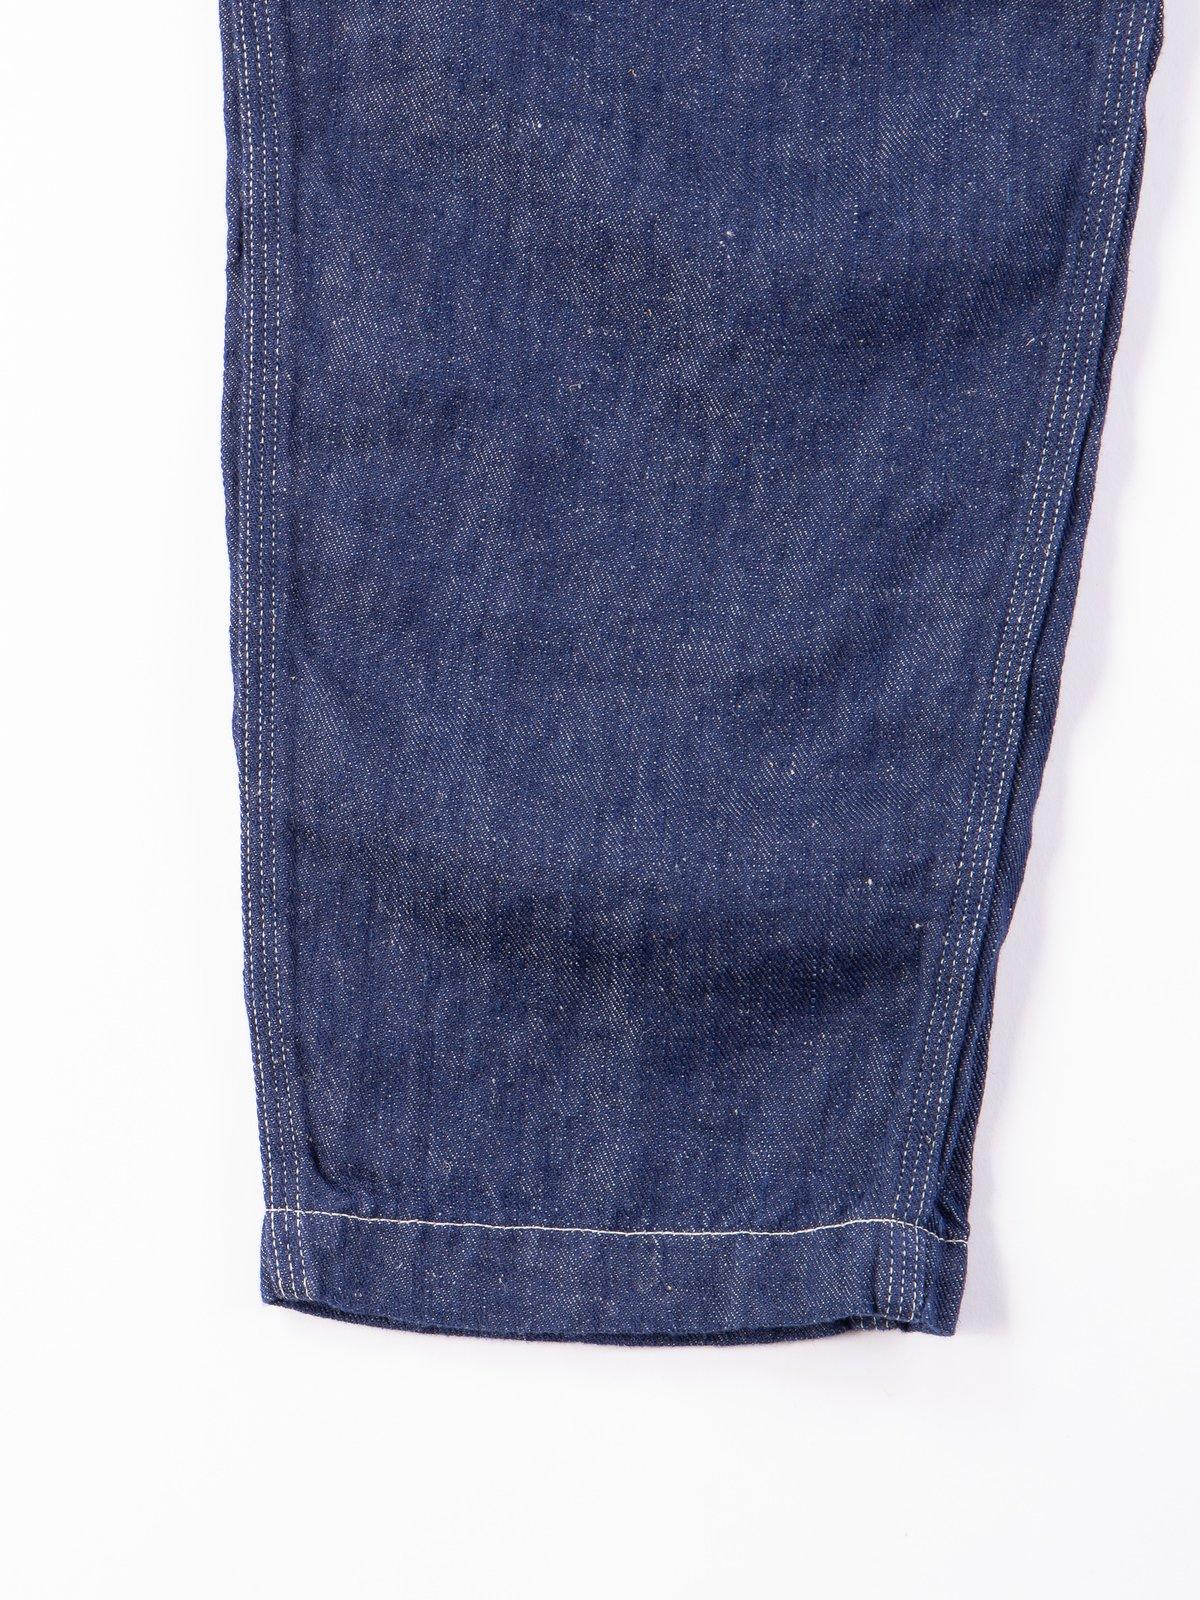 One Wash Linen Denim Climbing Pant - Image 5